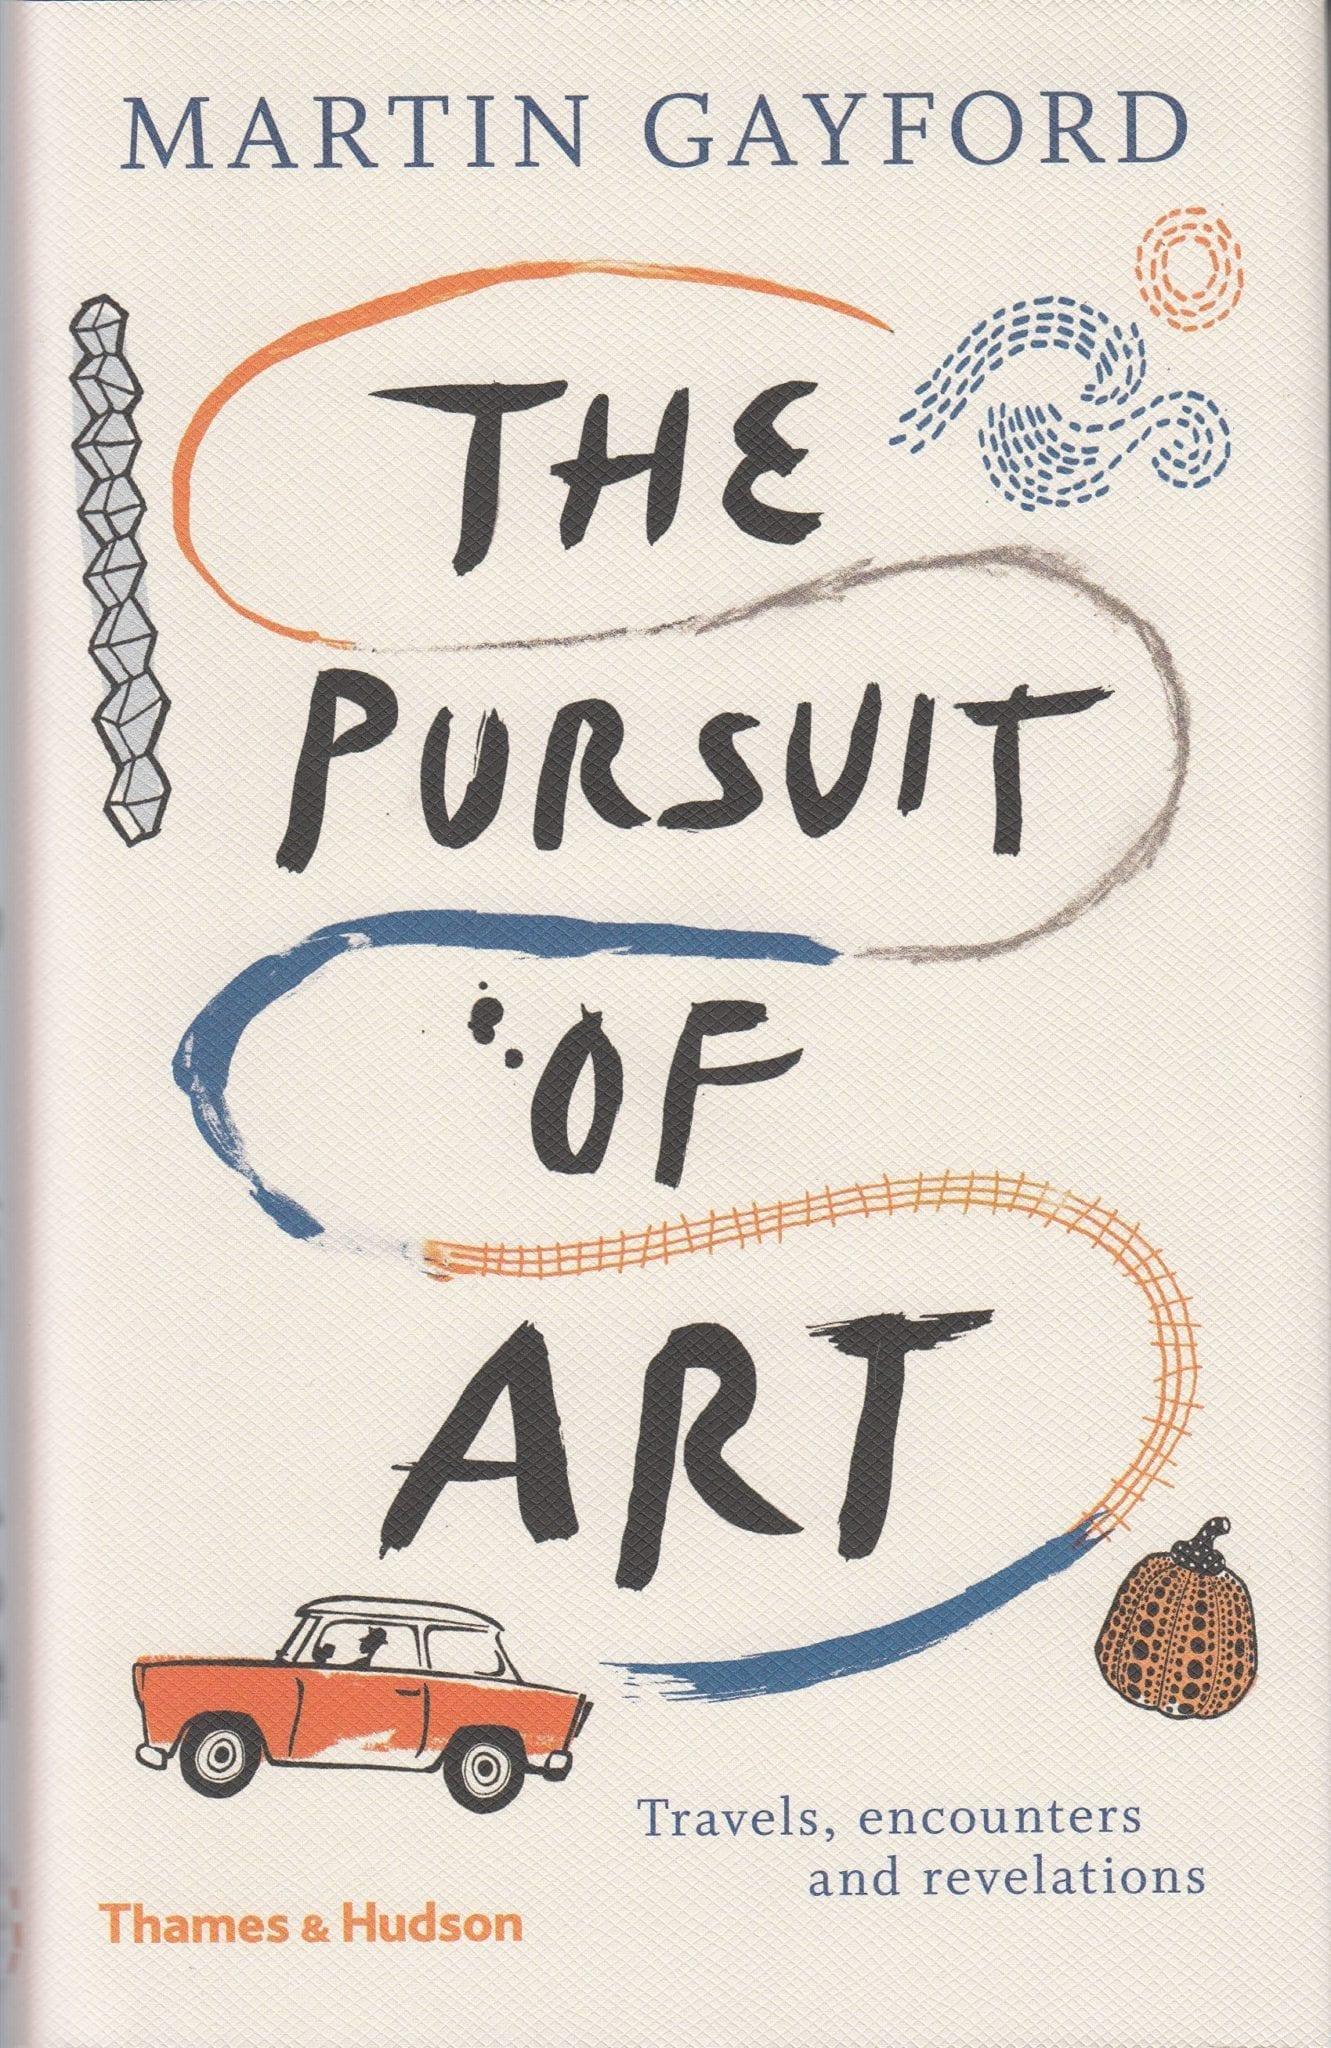 The Pursuit of Art